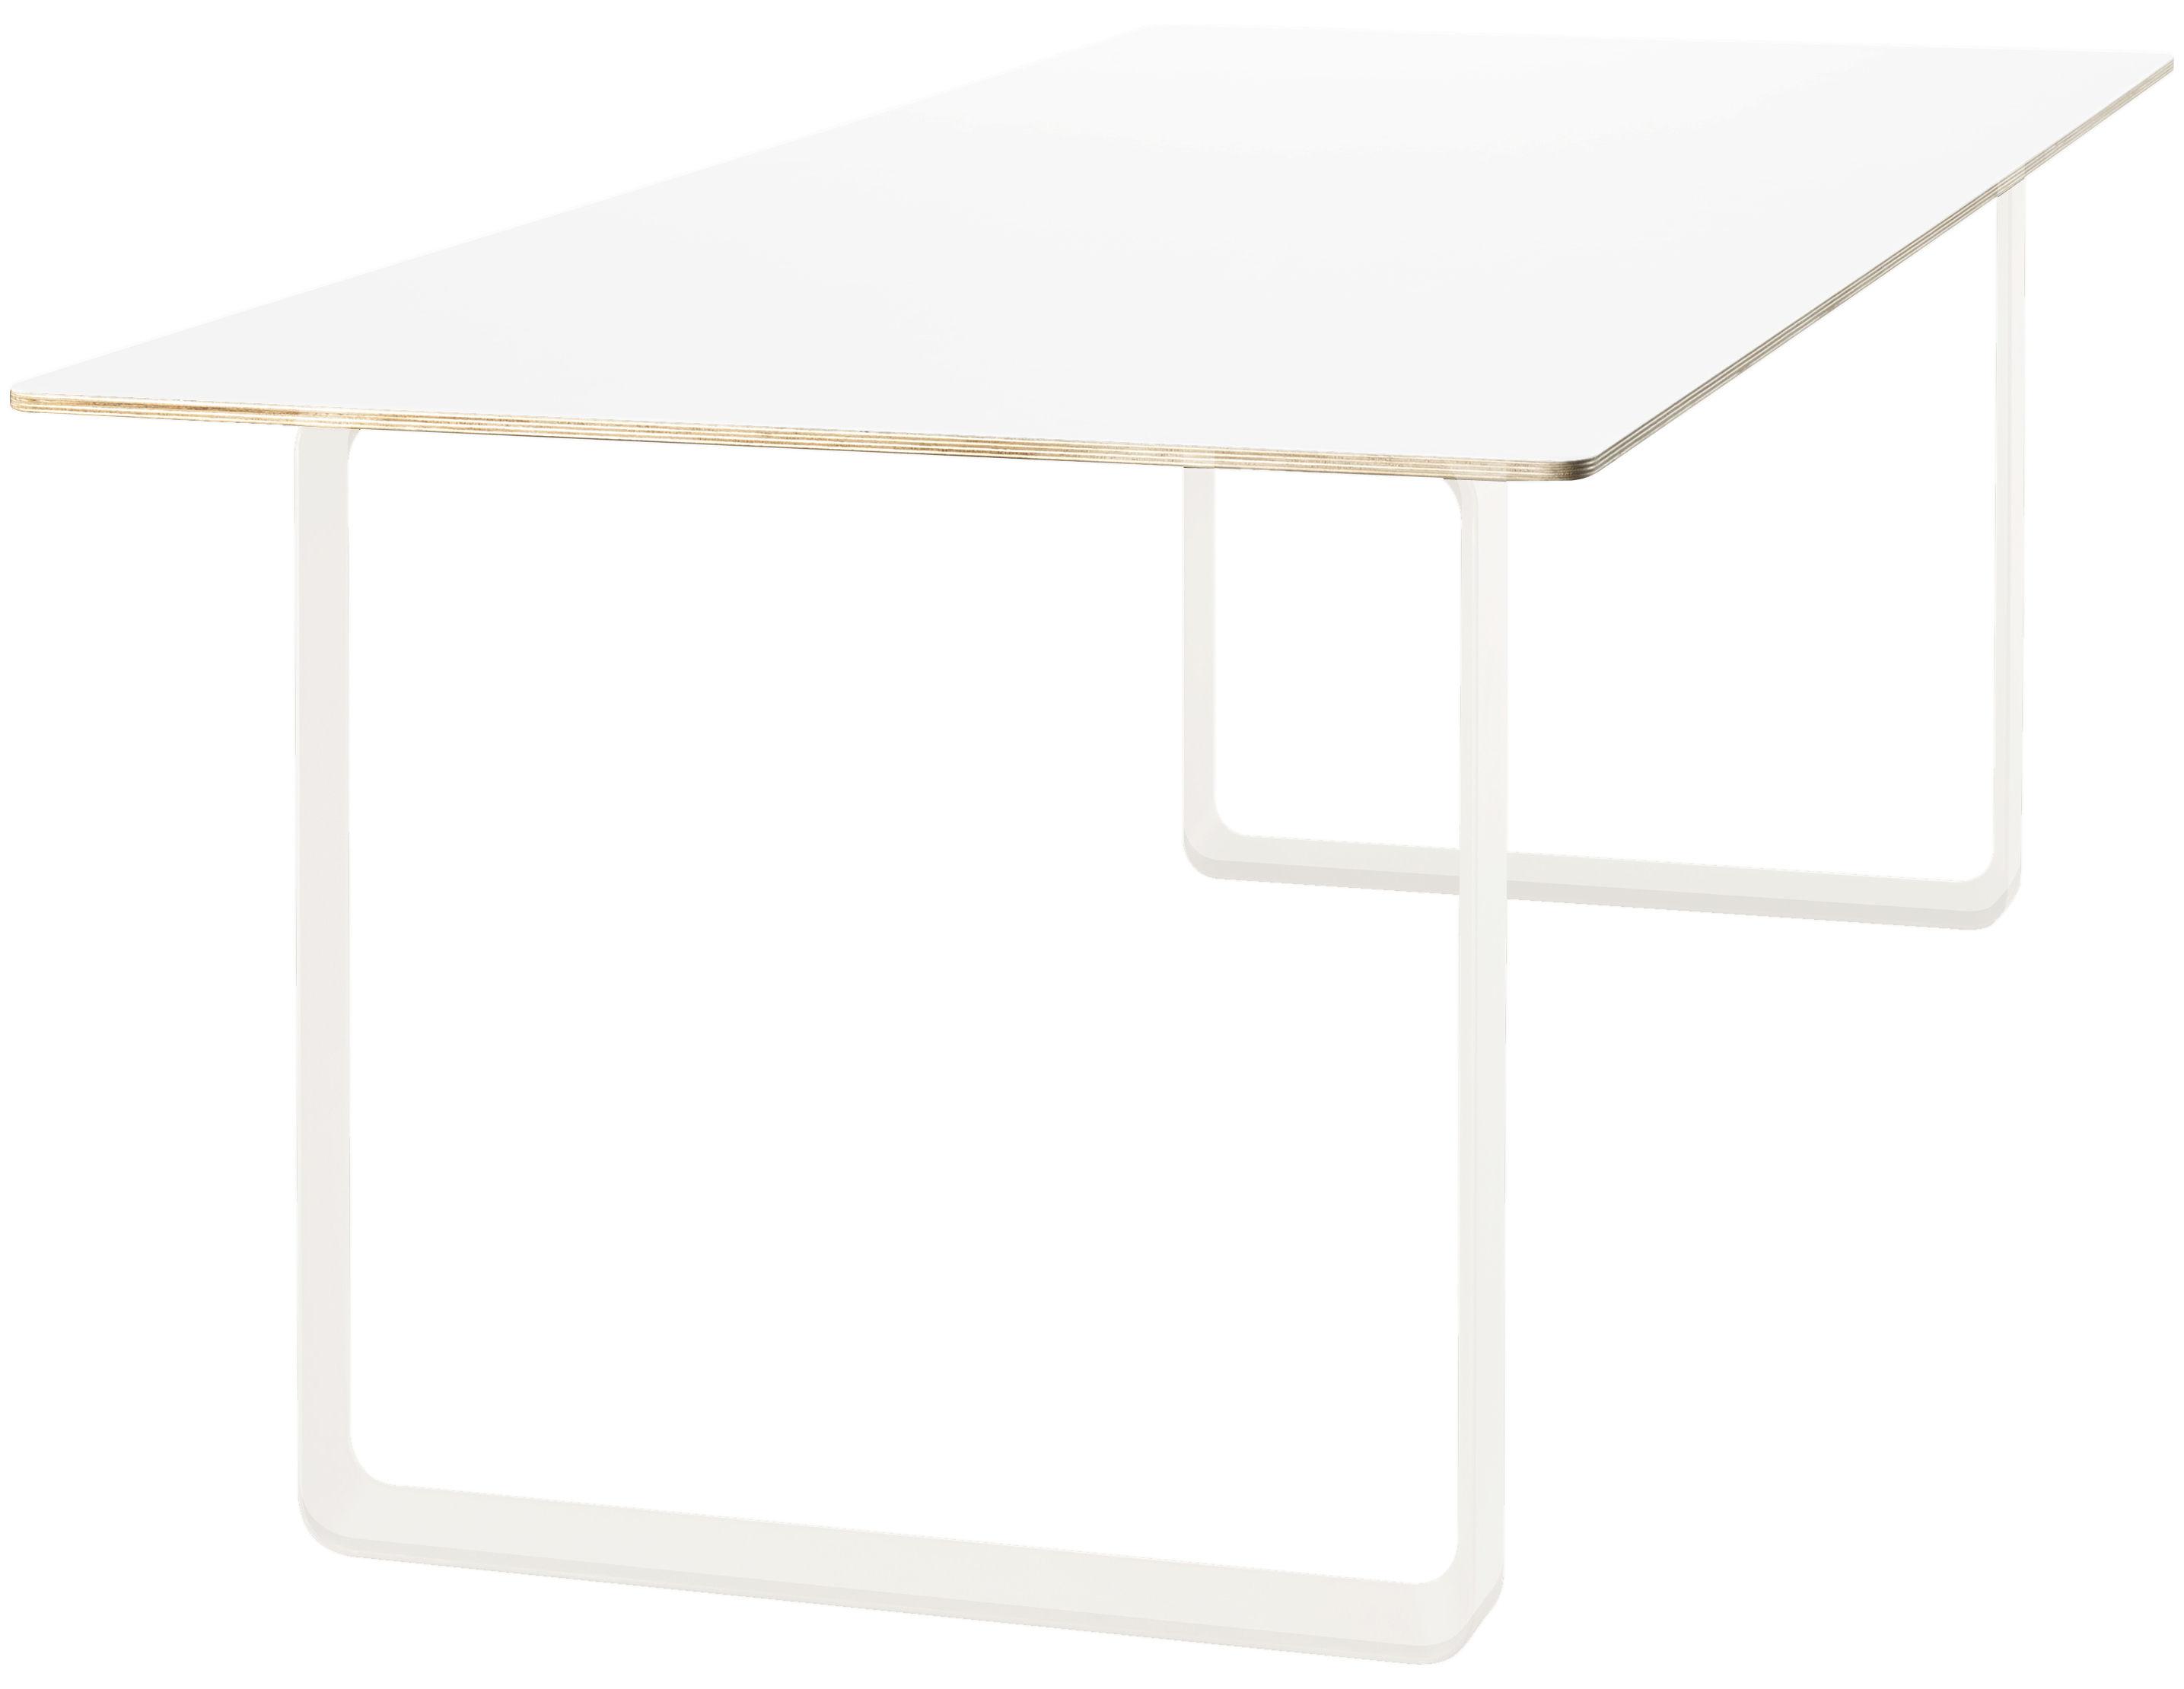 Mobilier - Tables - Table rectangulaire 70-70 / 225 x 90 cm - Contreplaqué - Muuto - Blanc - Aluminium, Contreplaqué, Mélamine